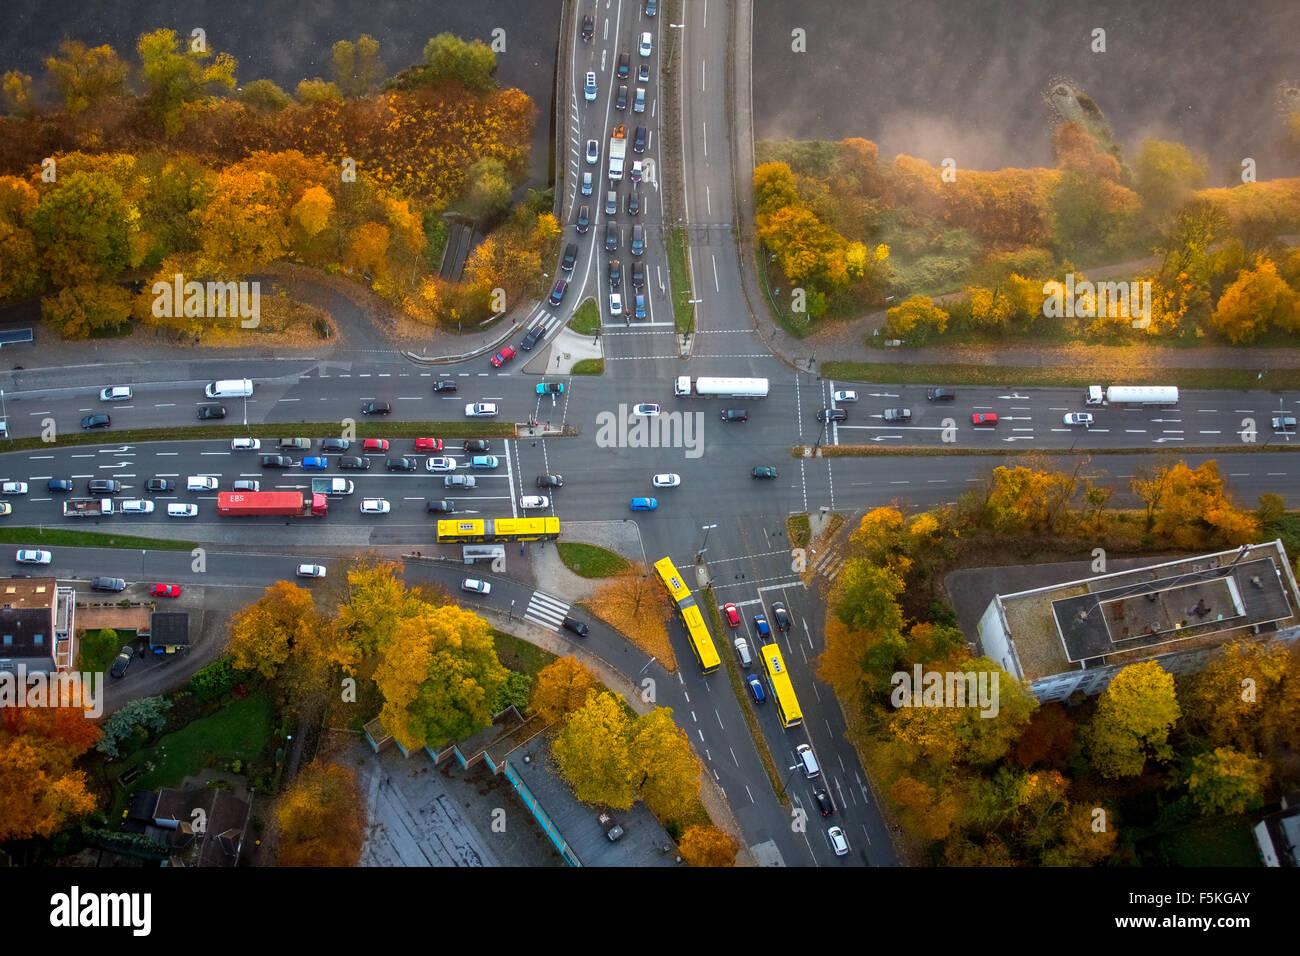 Road Junction, yellow buses EVAG, autumn leaves, autumn Essen Ruhrgebiet North Rhine-Westphalia Germany - Stock Image